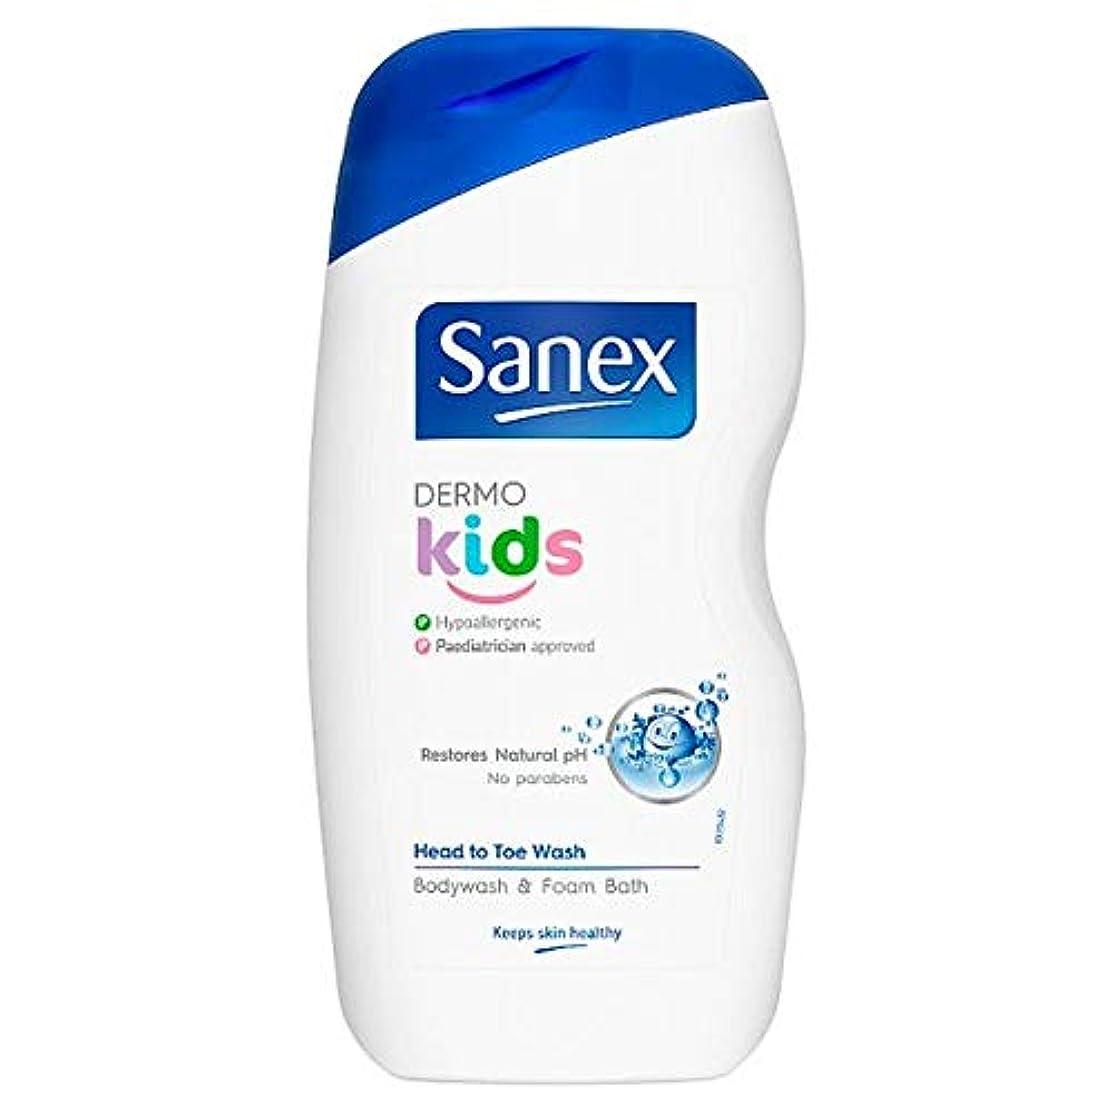 [Sanex] Sanexは子供のボディウォッシュをゼロと500ミリリットルをFoambath - Sanex Zero Kids Body Wash And Foambath 500Ml [並行輸入品]